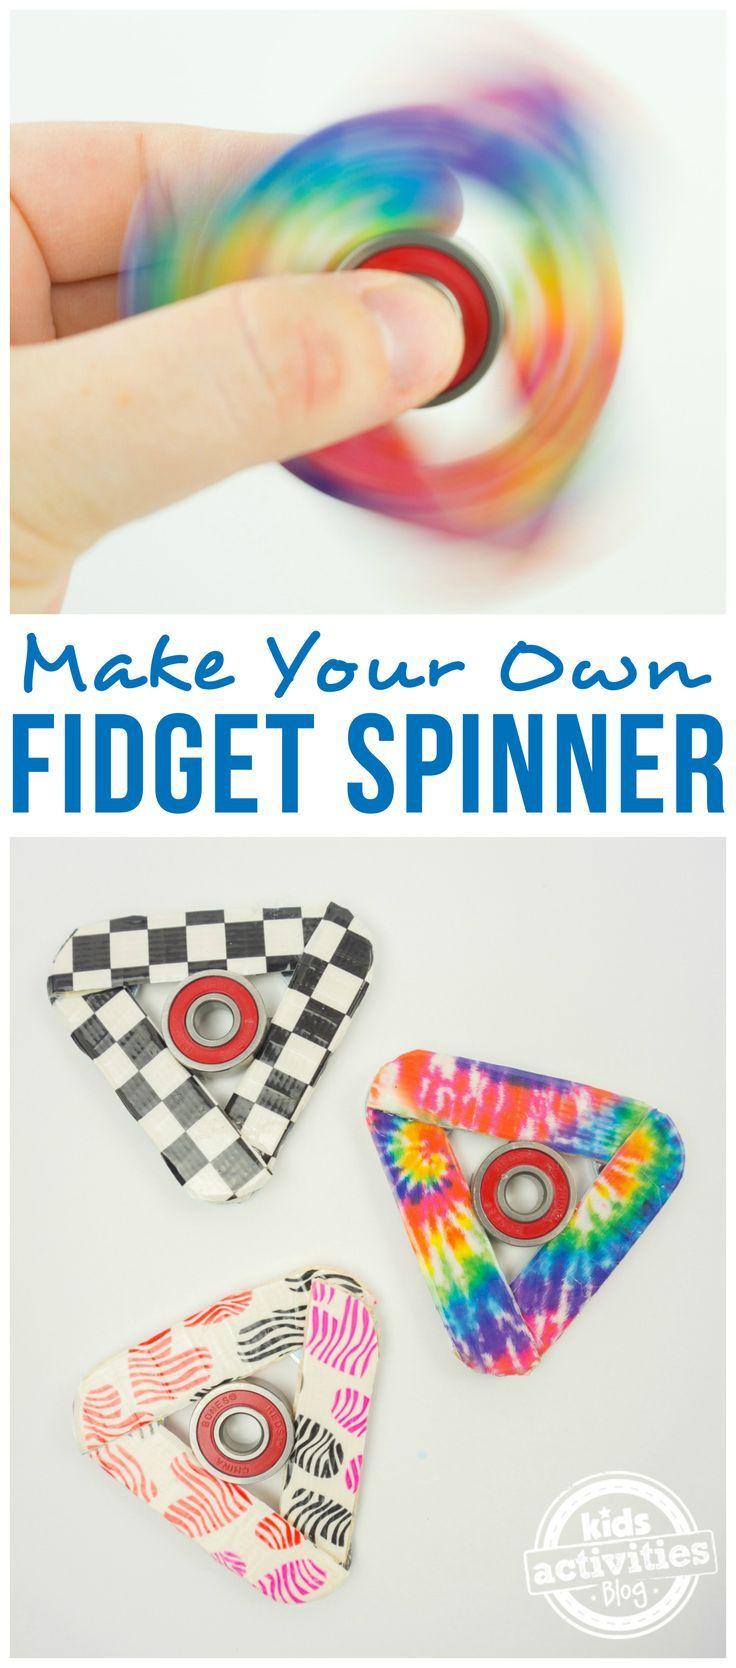 Download Good DIY Kids from kidsactivitiesblog.com